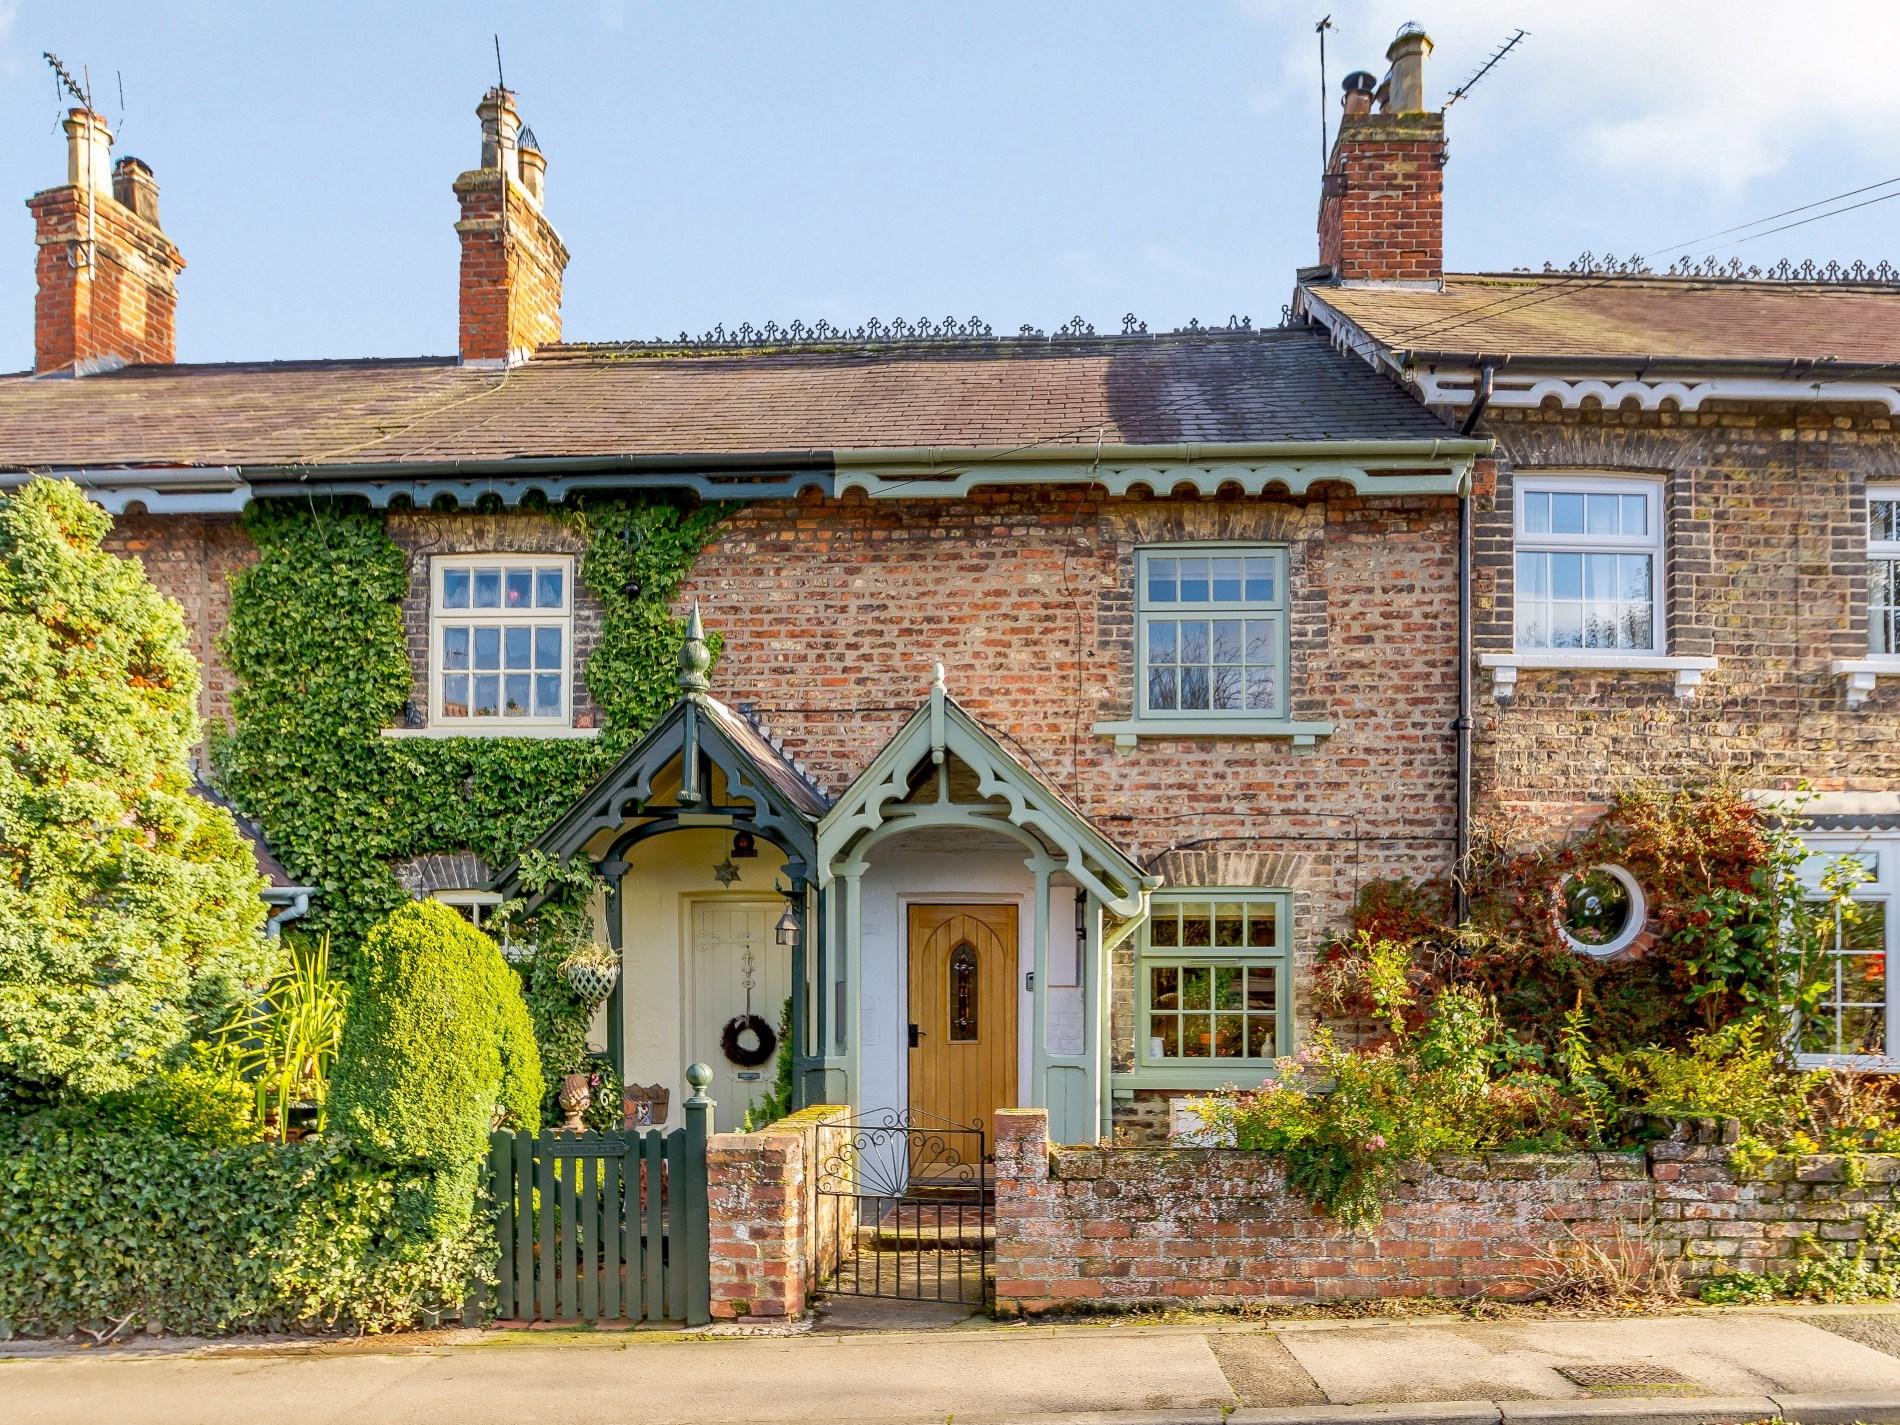 2 Bedroom Cottage in York, Yorkshire Dales